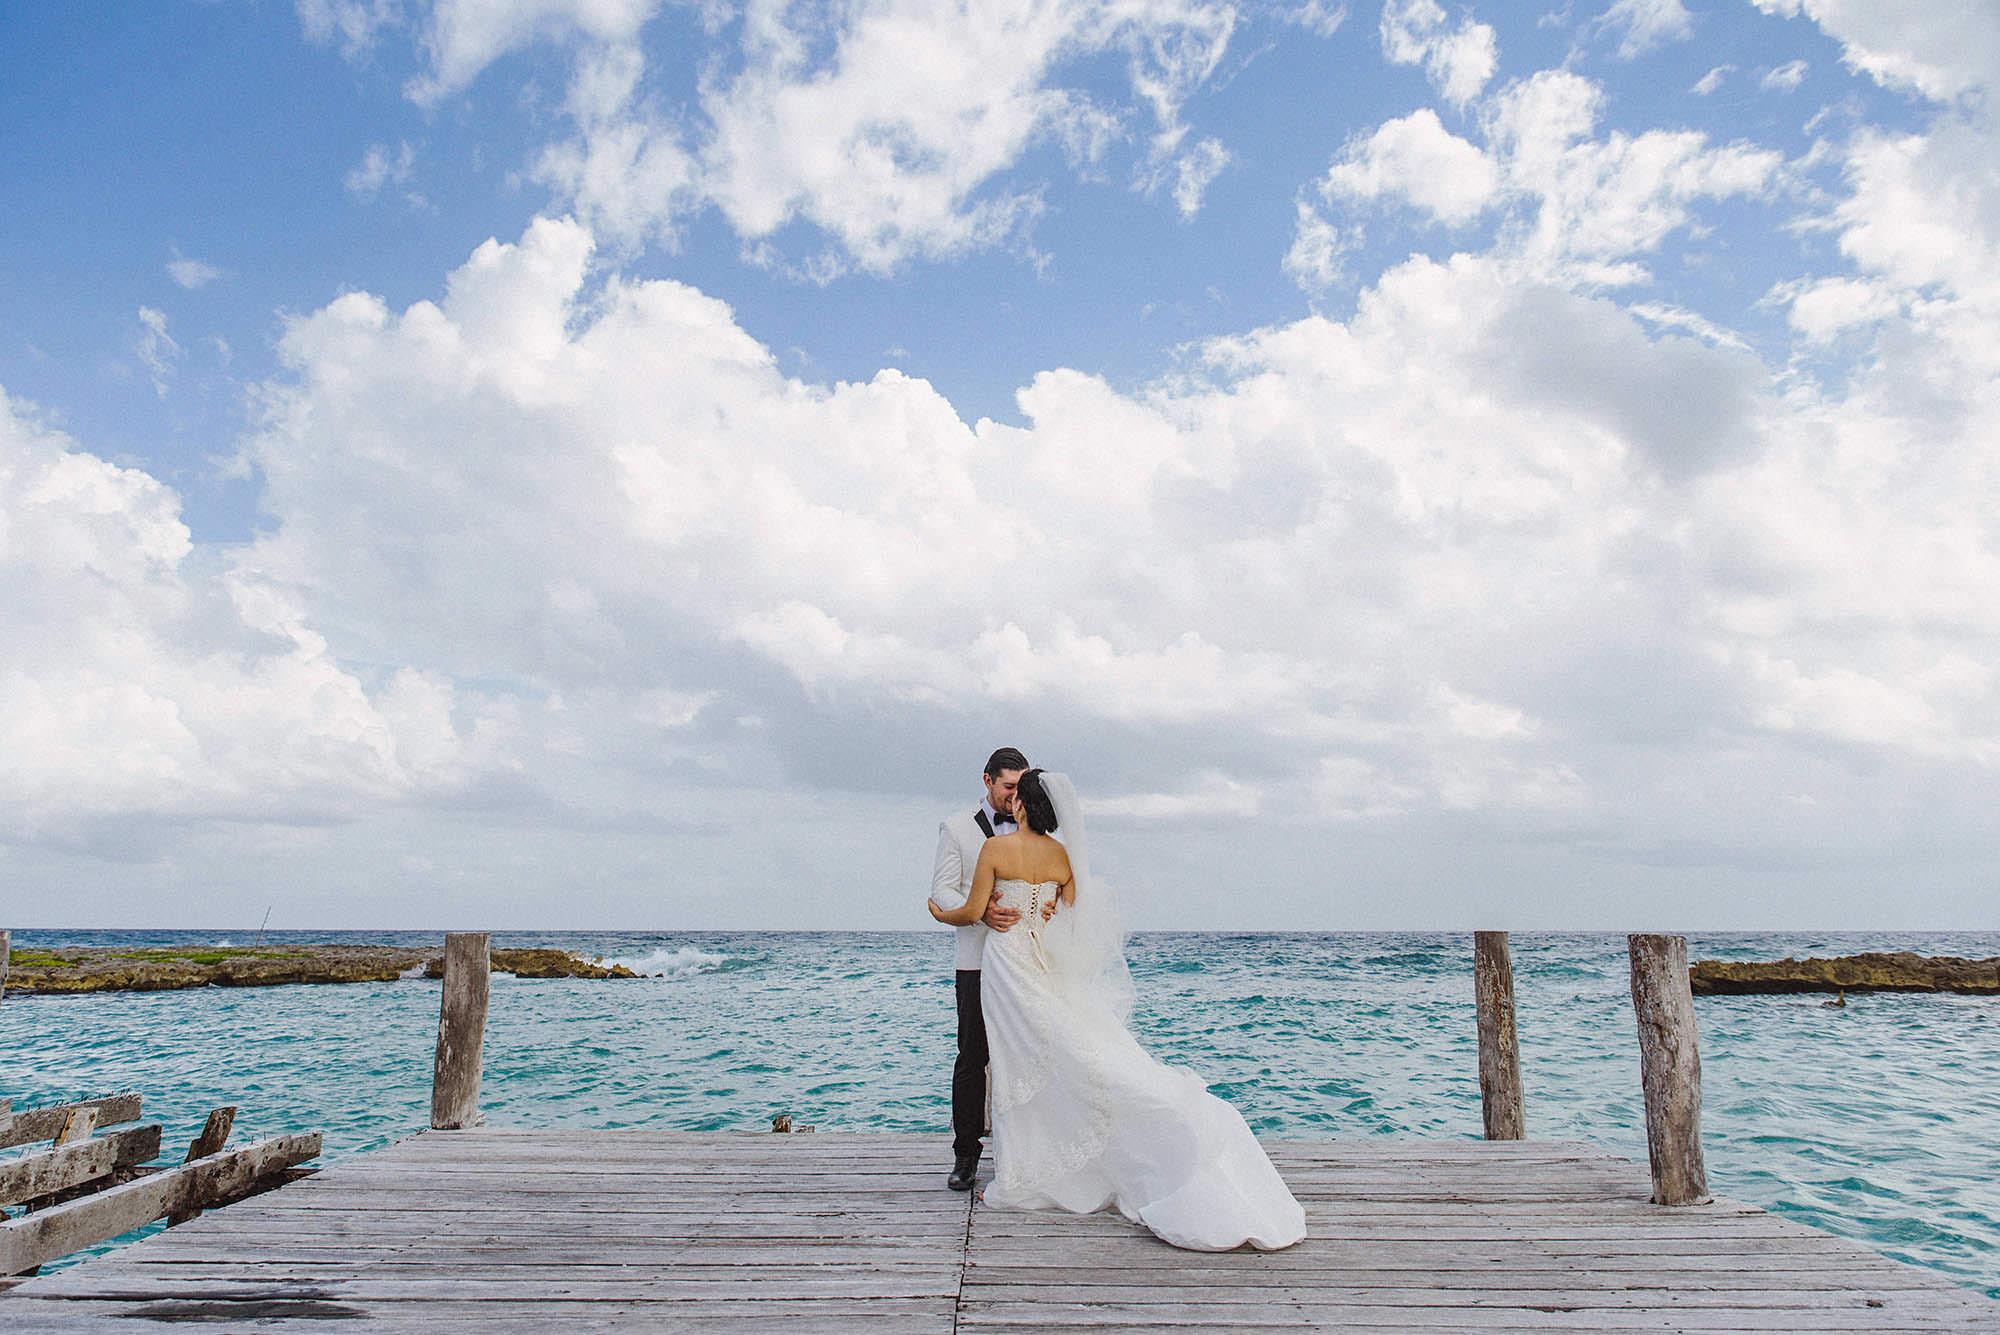 Wedding playa del carmen planner destination mexico magali espinosa23-WEB.jpg